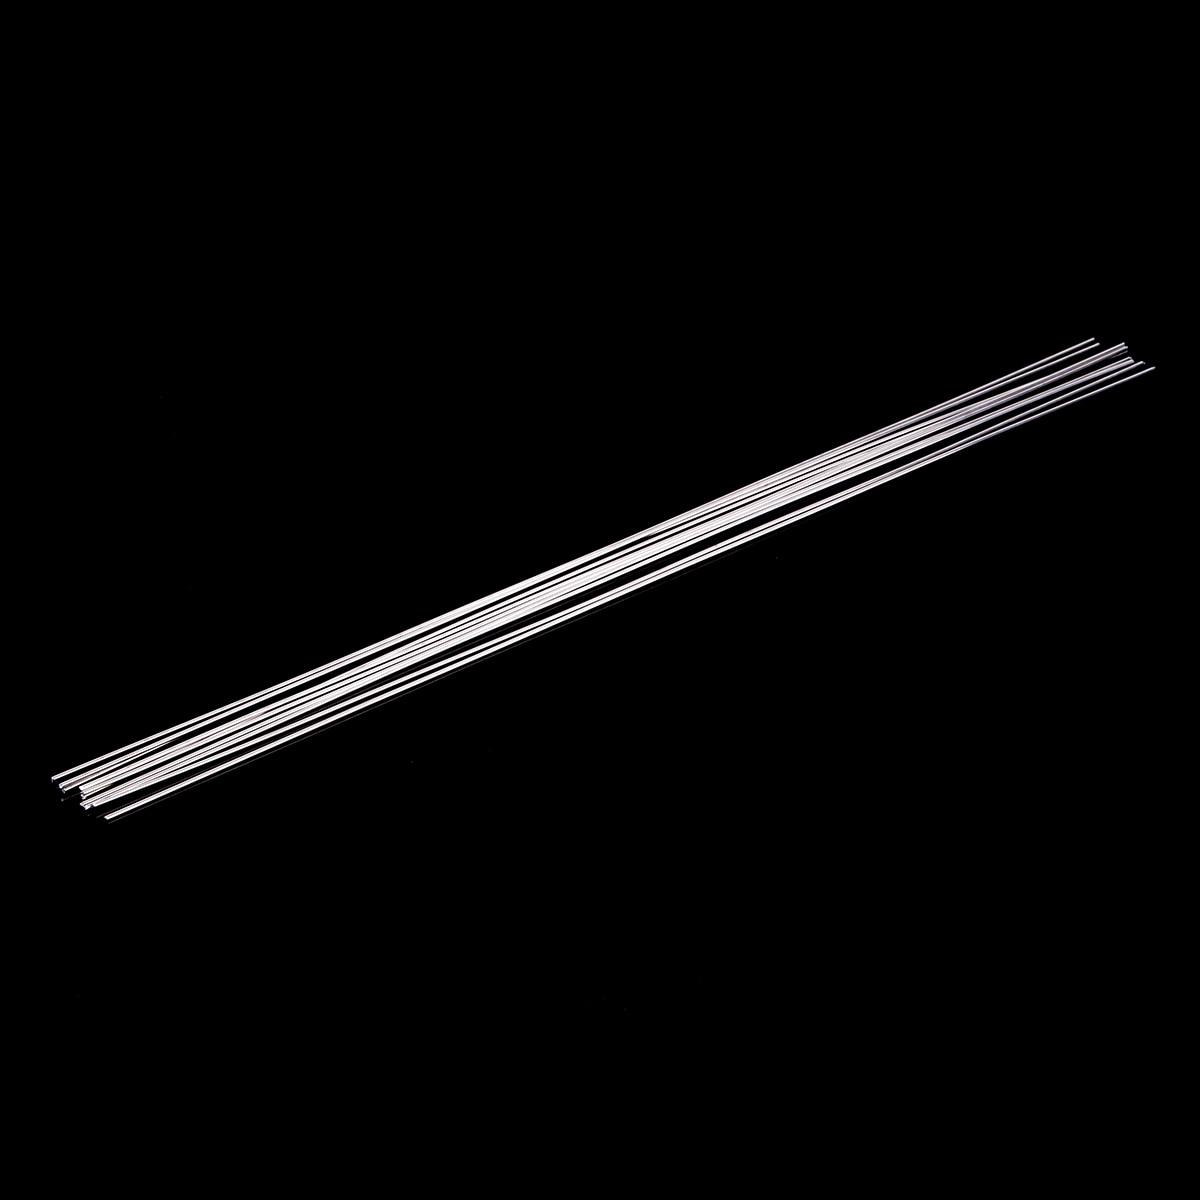 10pcs Metal Aluminum Welding Rod Low Temperature Magnesium Soldering Brazing Stick Rods 1.6mmx45cm Silver 3